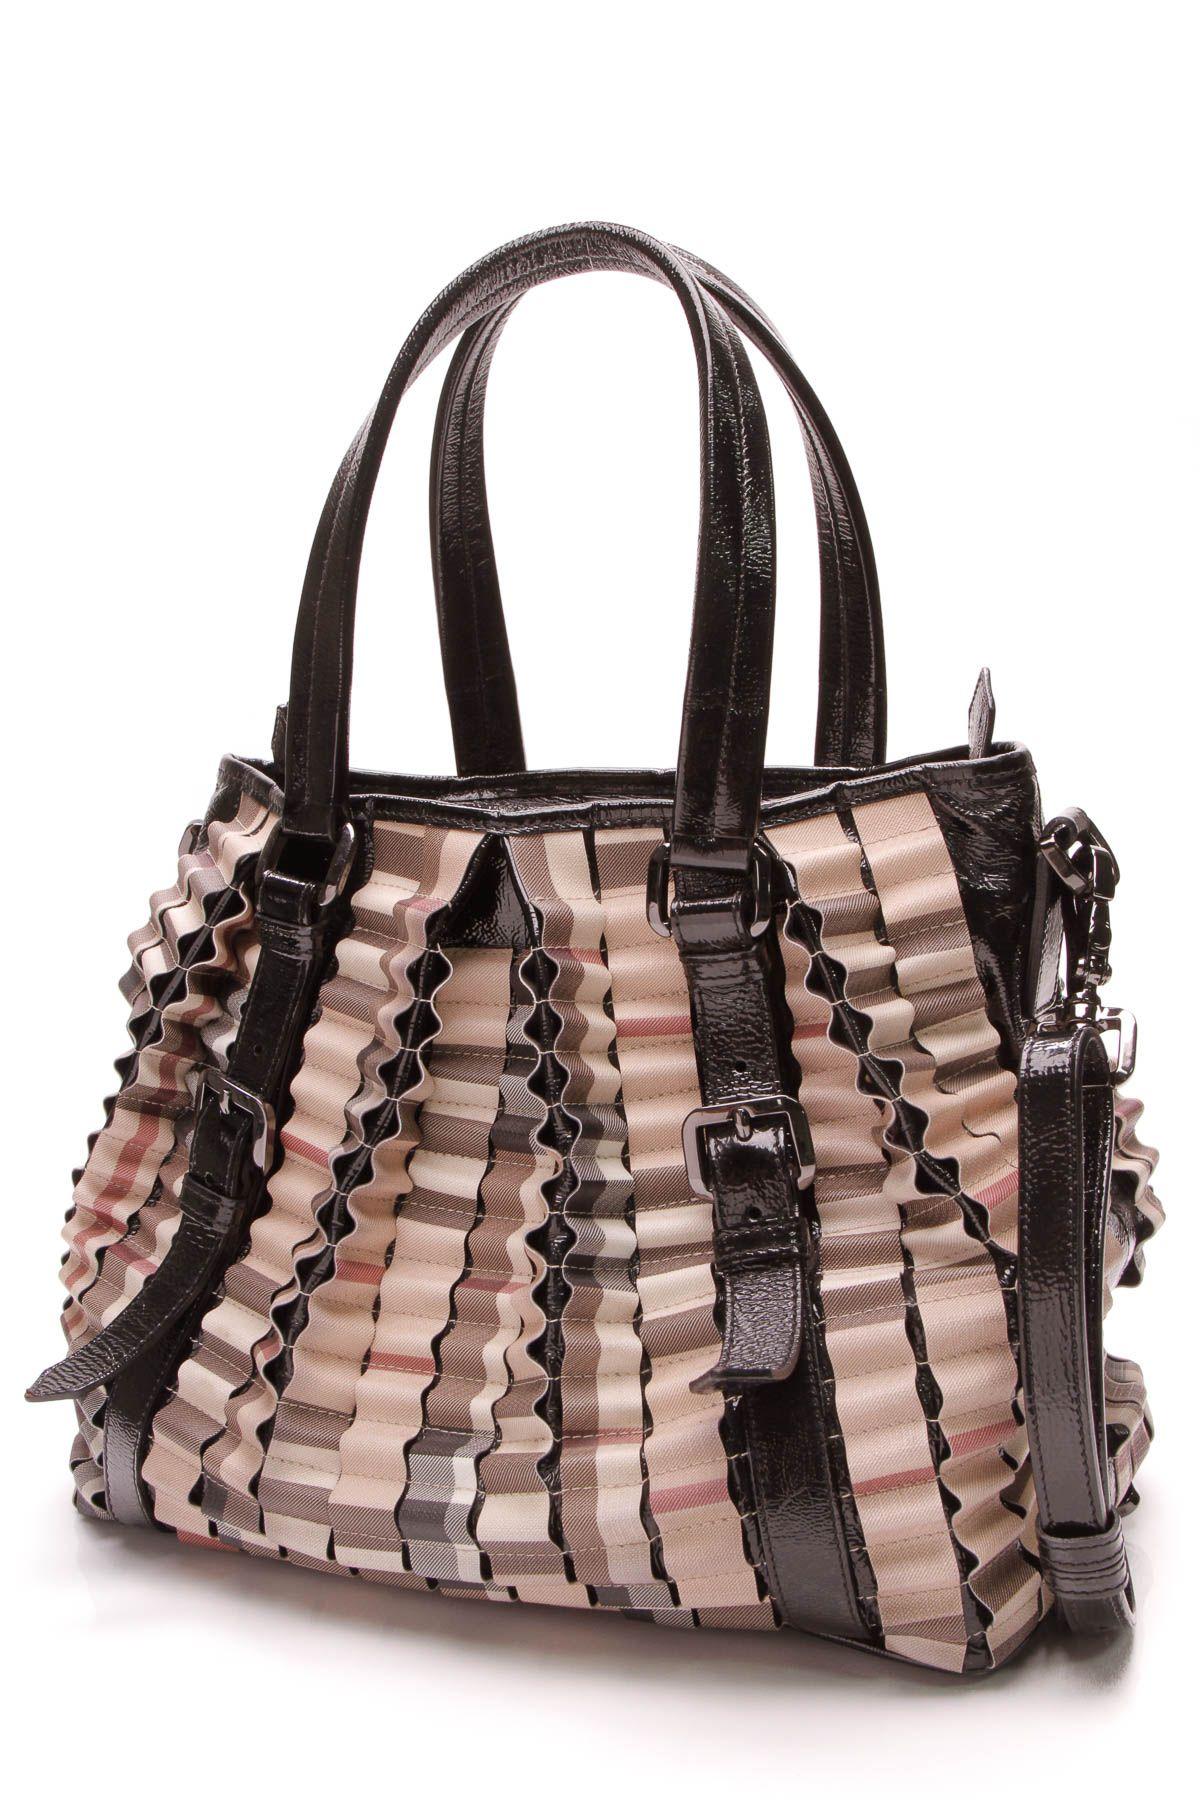 6dbdd2c99 Burberry Lowry Ruffled Large Tote Bag - Nova Check | In The Bag ...